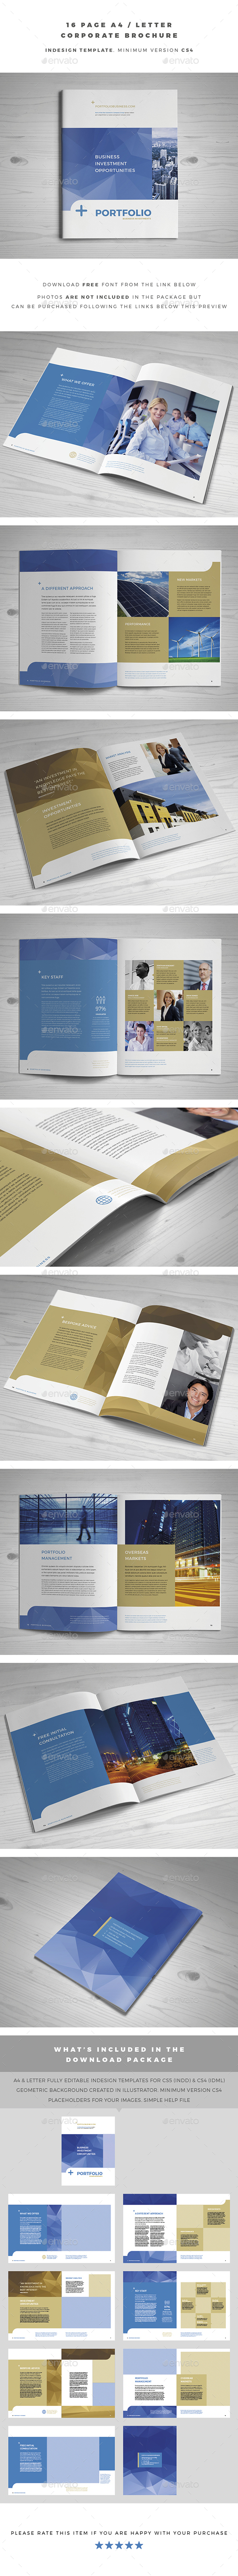 A4 / Letter Corporate Brochure - Corporate Brochures